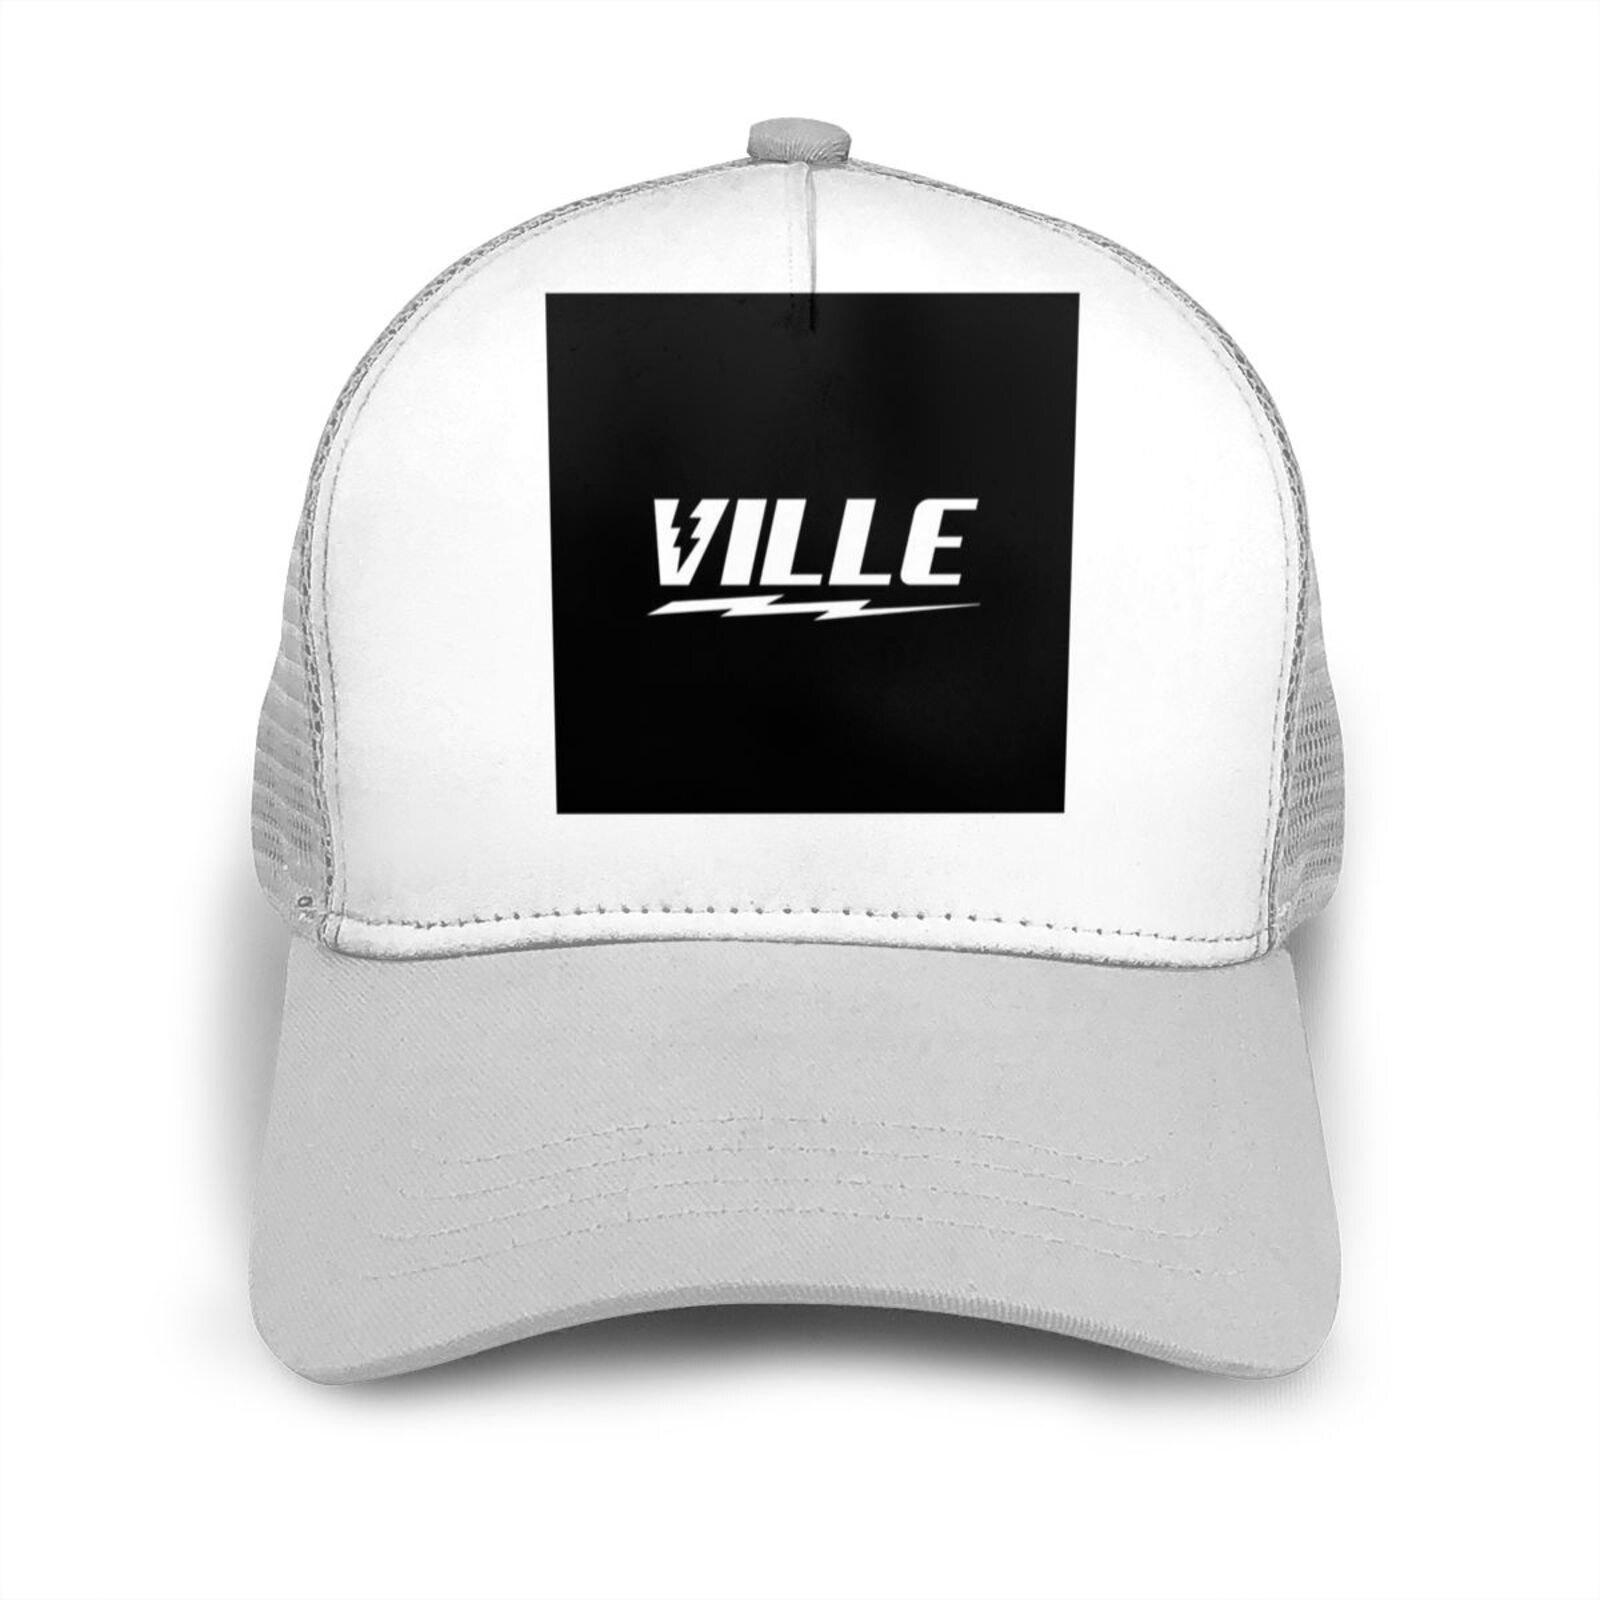 La Ville de tapa plana curva sombreo gorra de malla Ville 999...